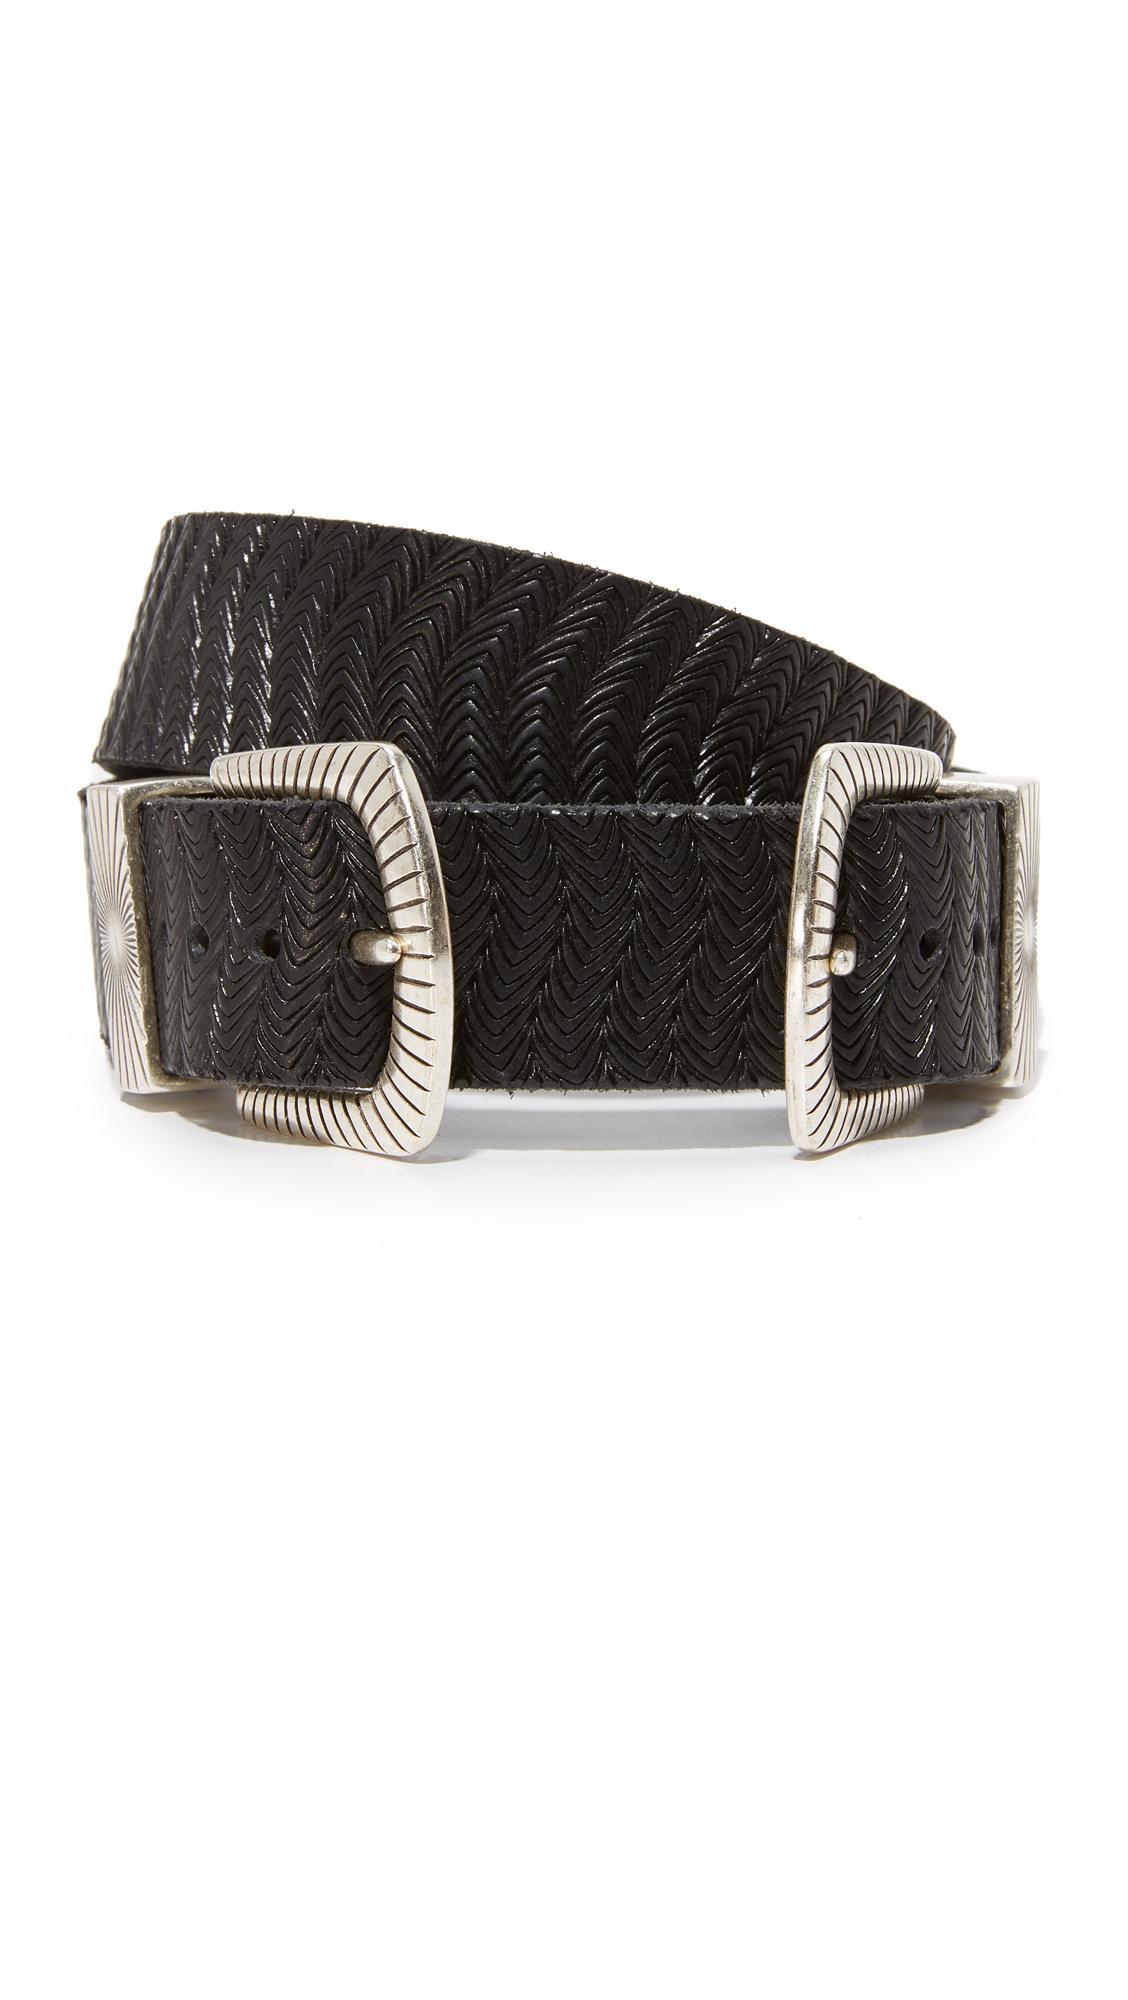 B. Belt Double Buckle Embossed Belt - Black